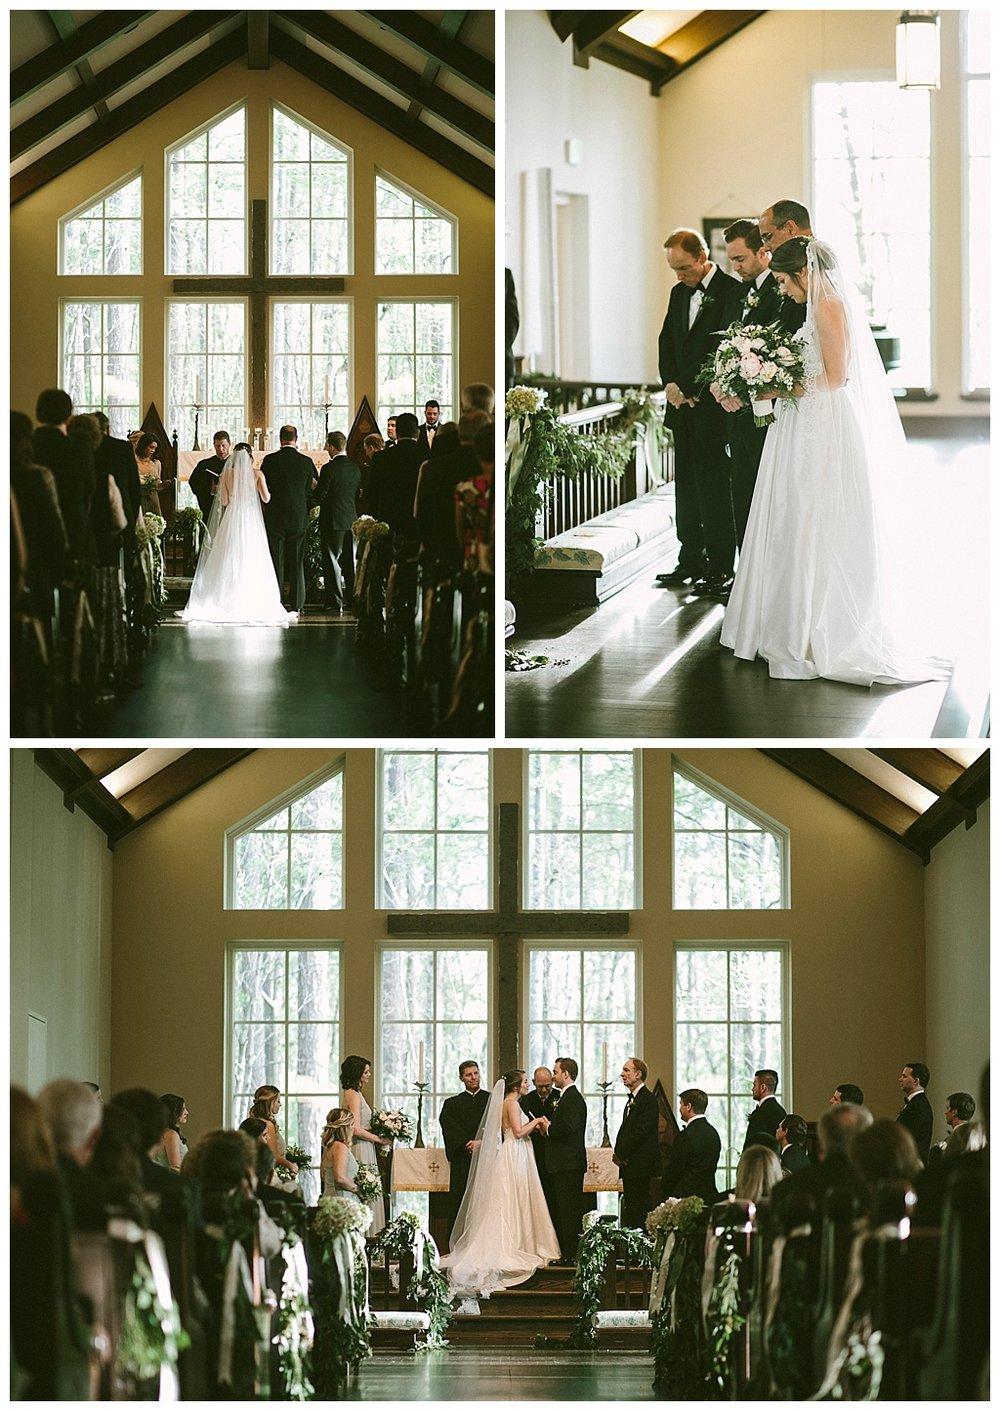 two-hearts-weddings-st-stephens-episcopal-church-avon-theater-birmingham-alabama-wedding_0031.jpg